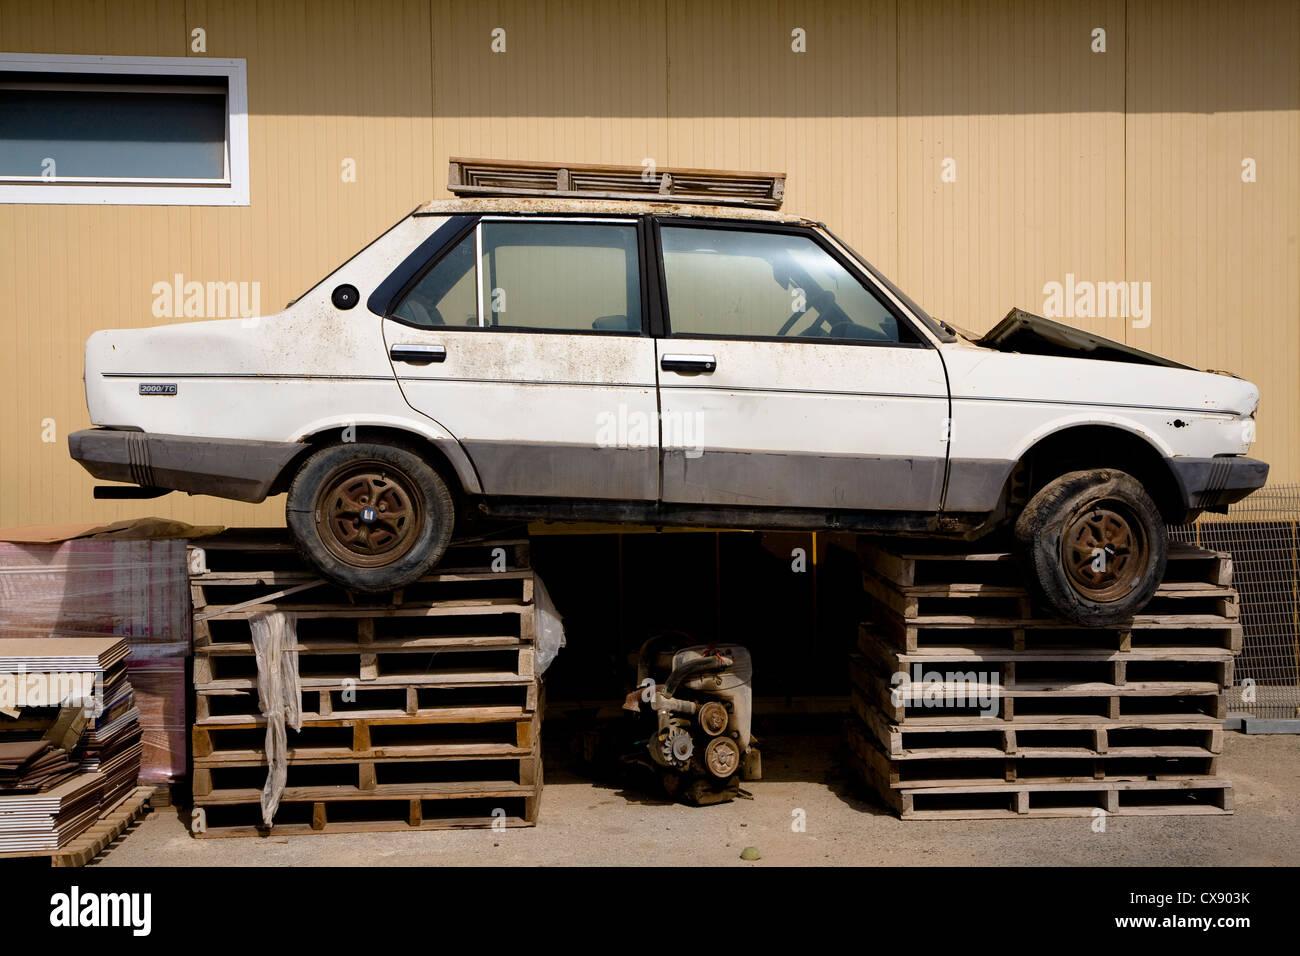 Broken down car resting on a set of pallets outside a workshop - Stock Image